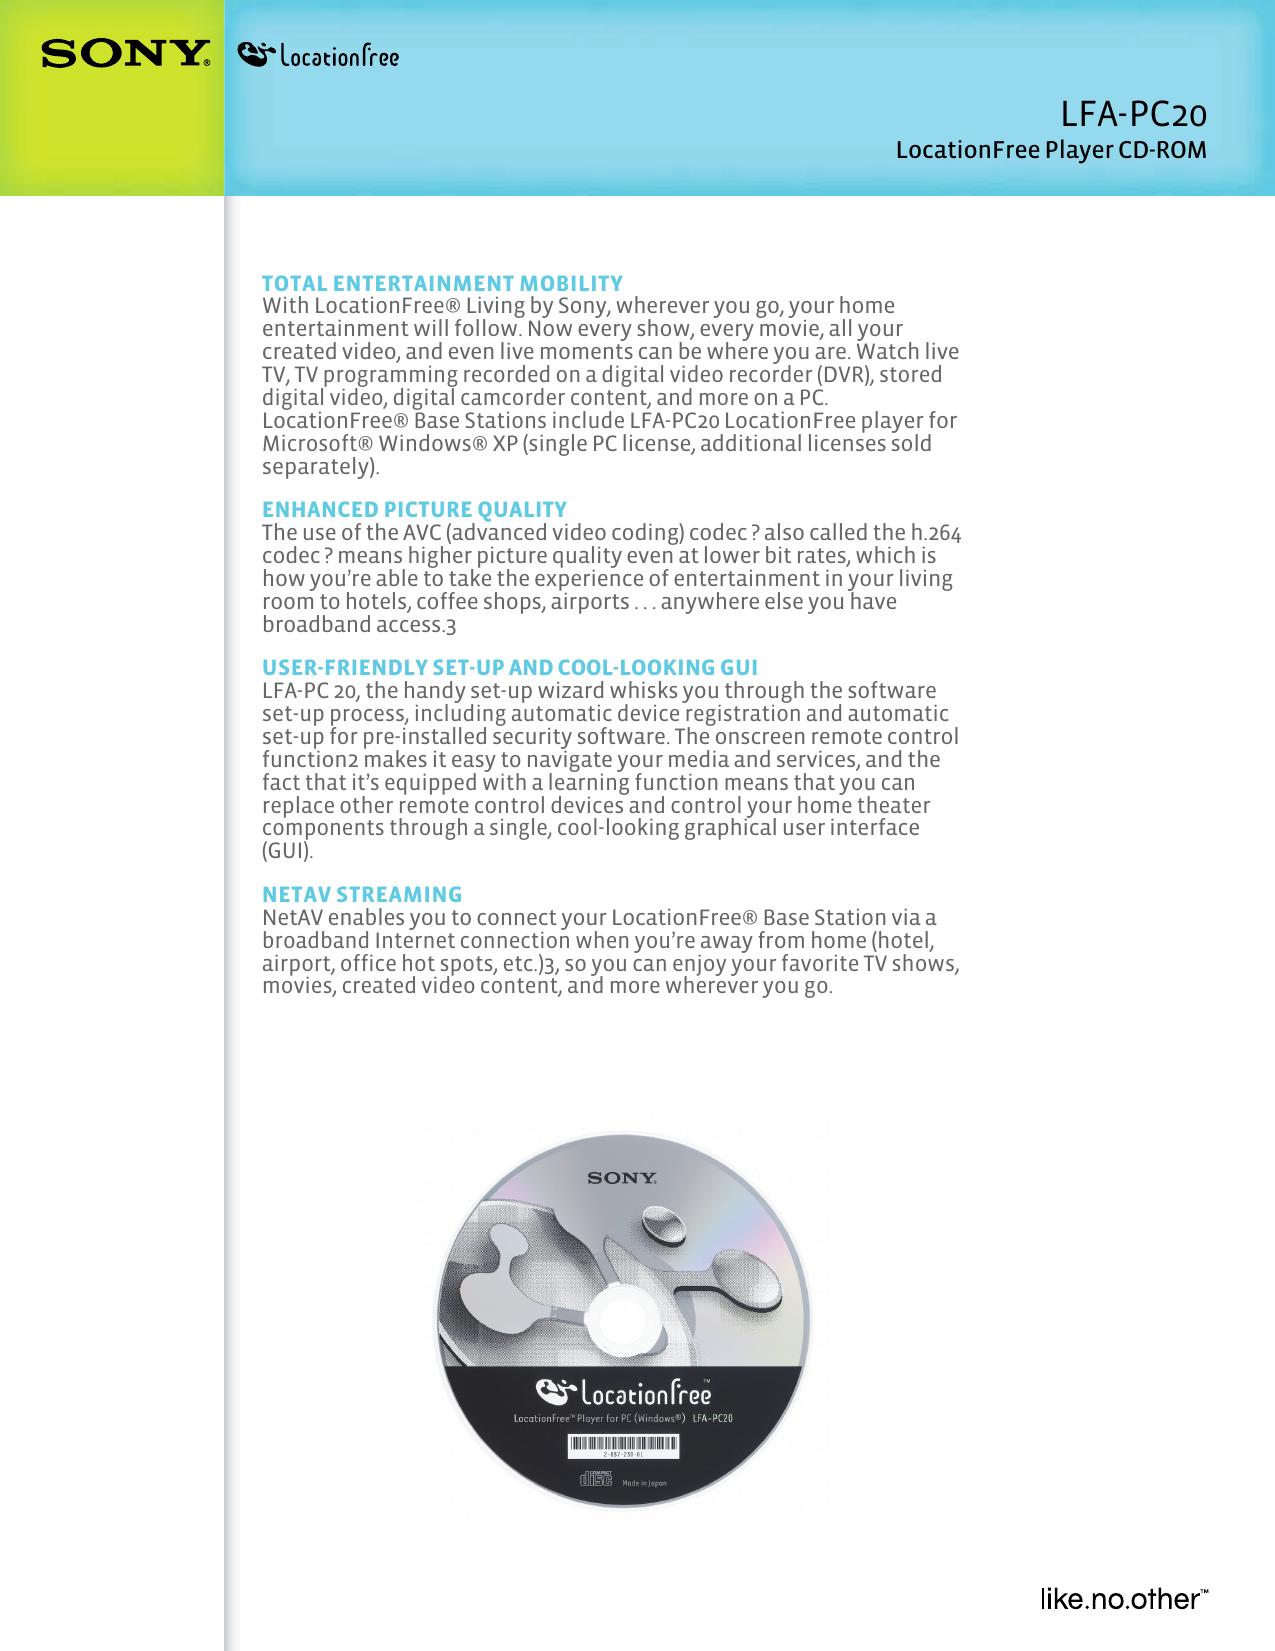 Sony LF B20 User Manual Marketing Specifications (LFA PC20